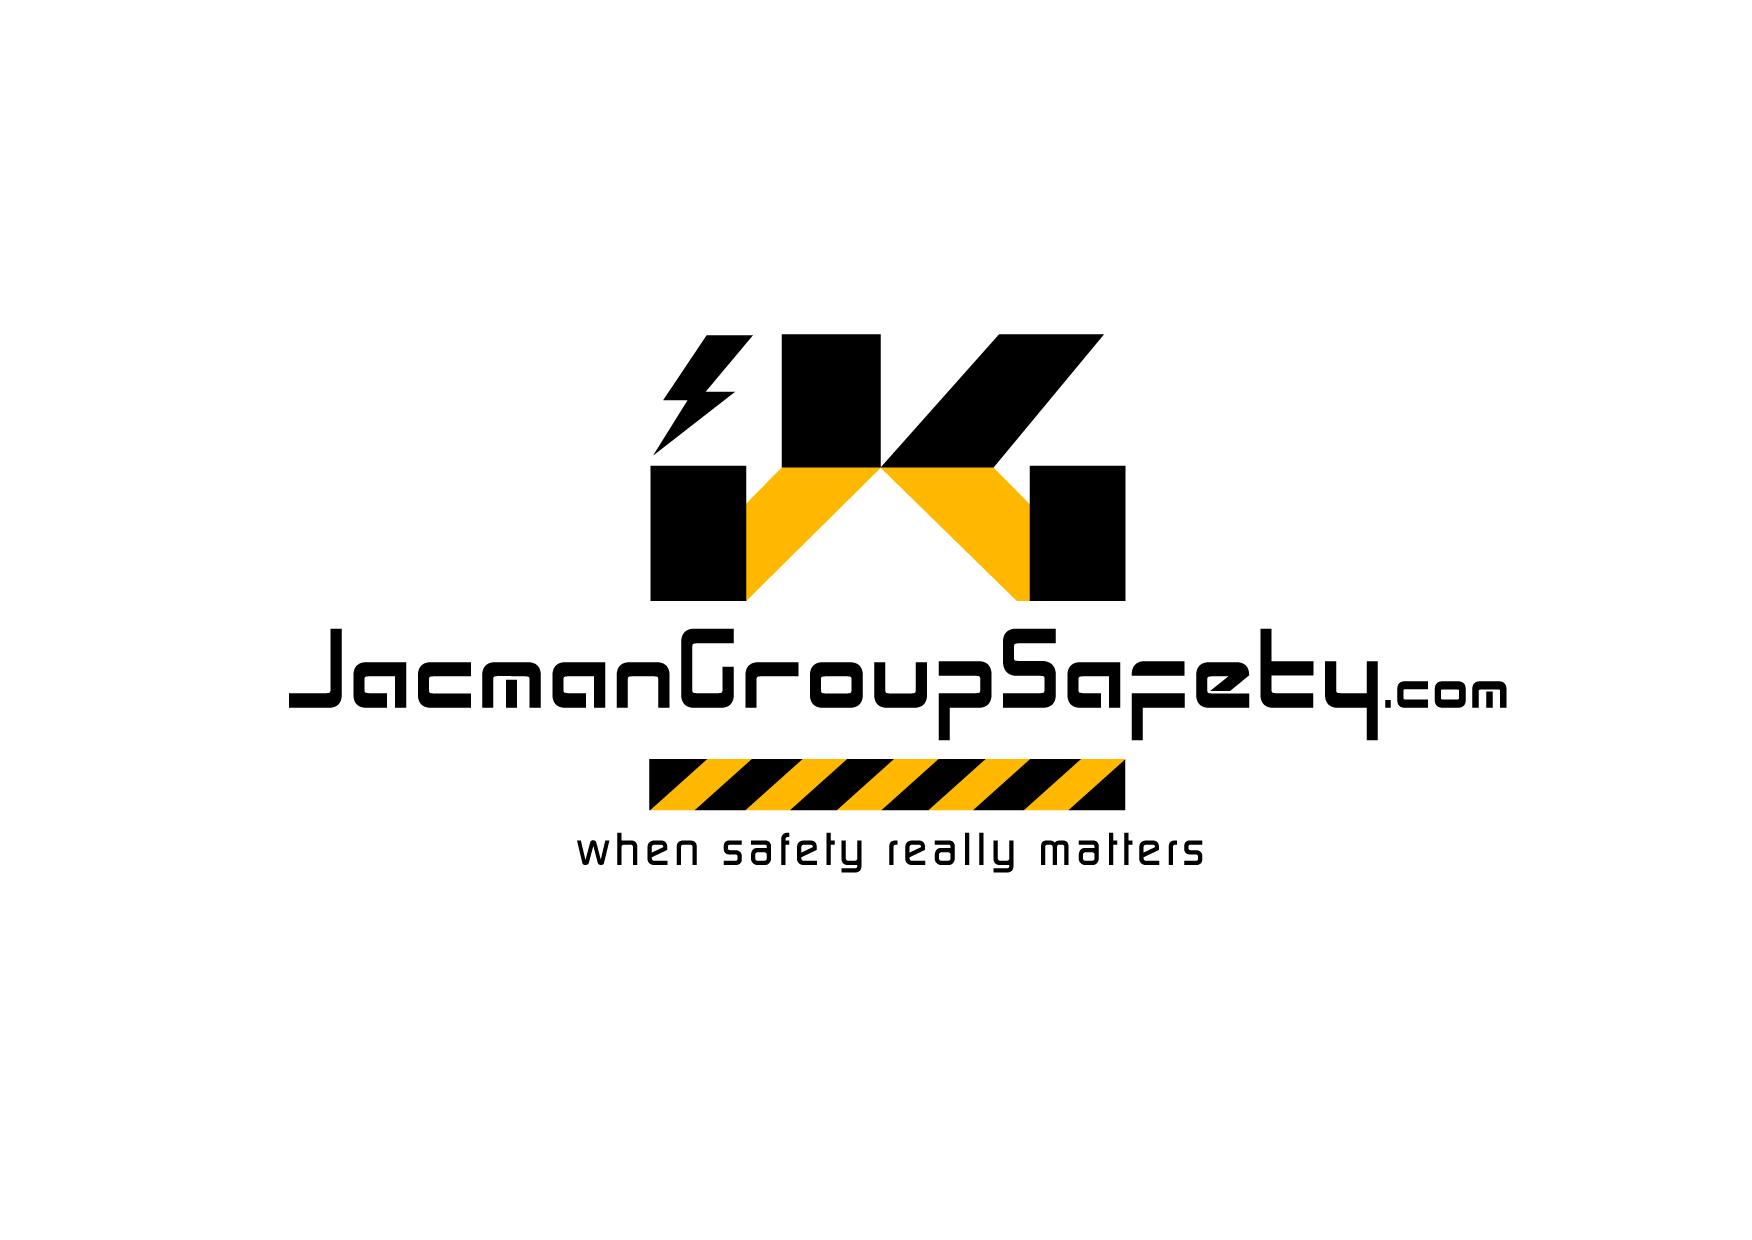 The Jacman Group Logo Design